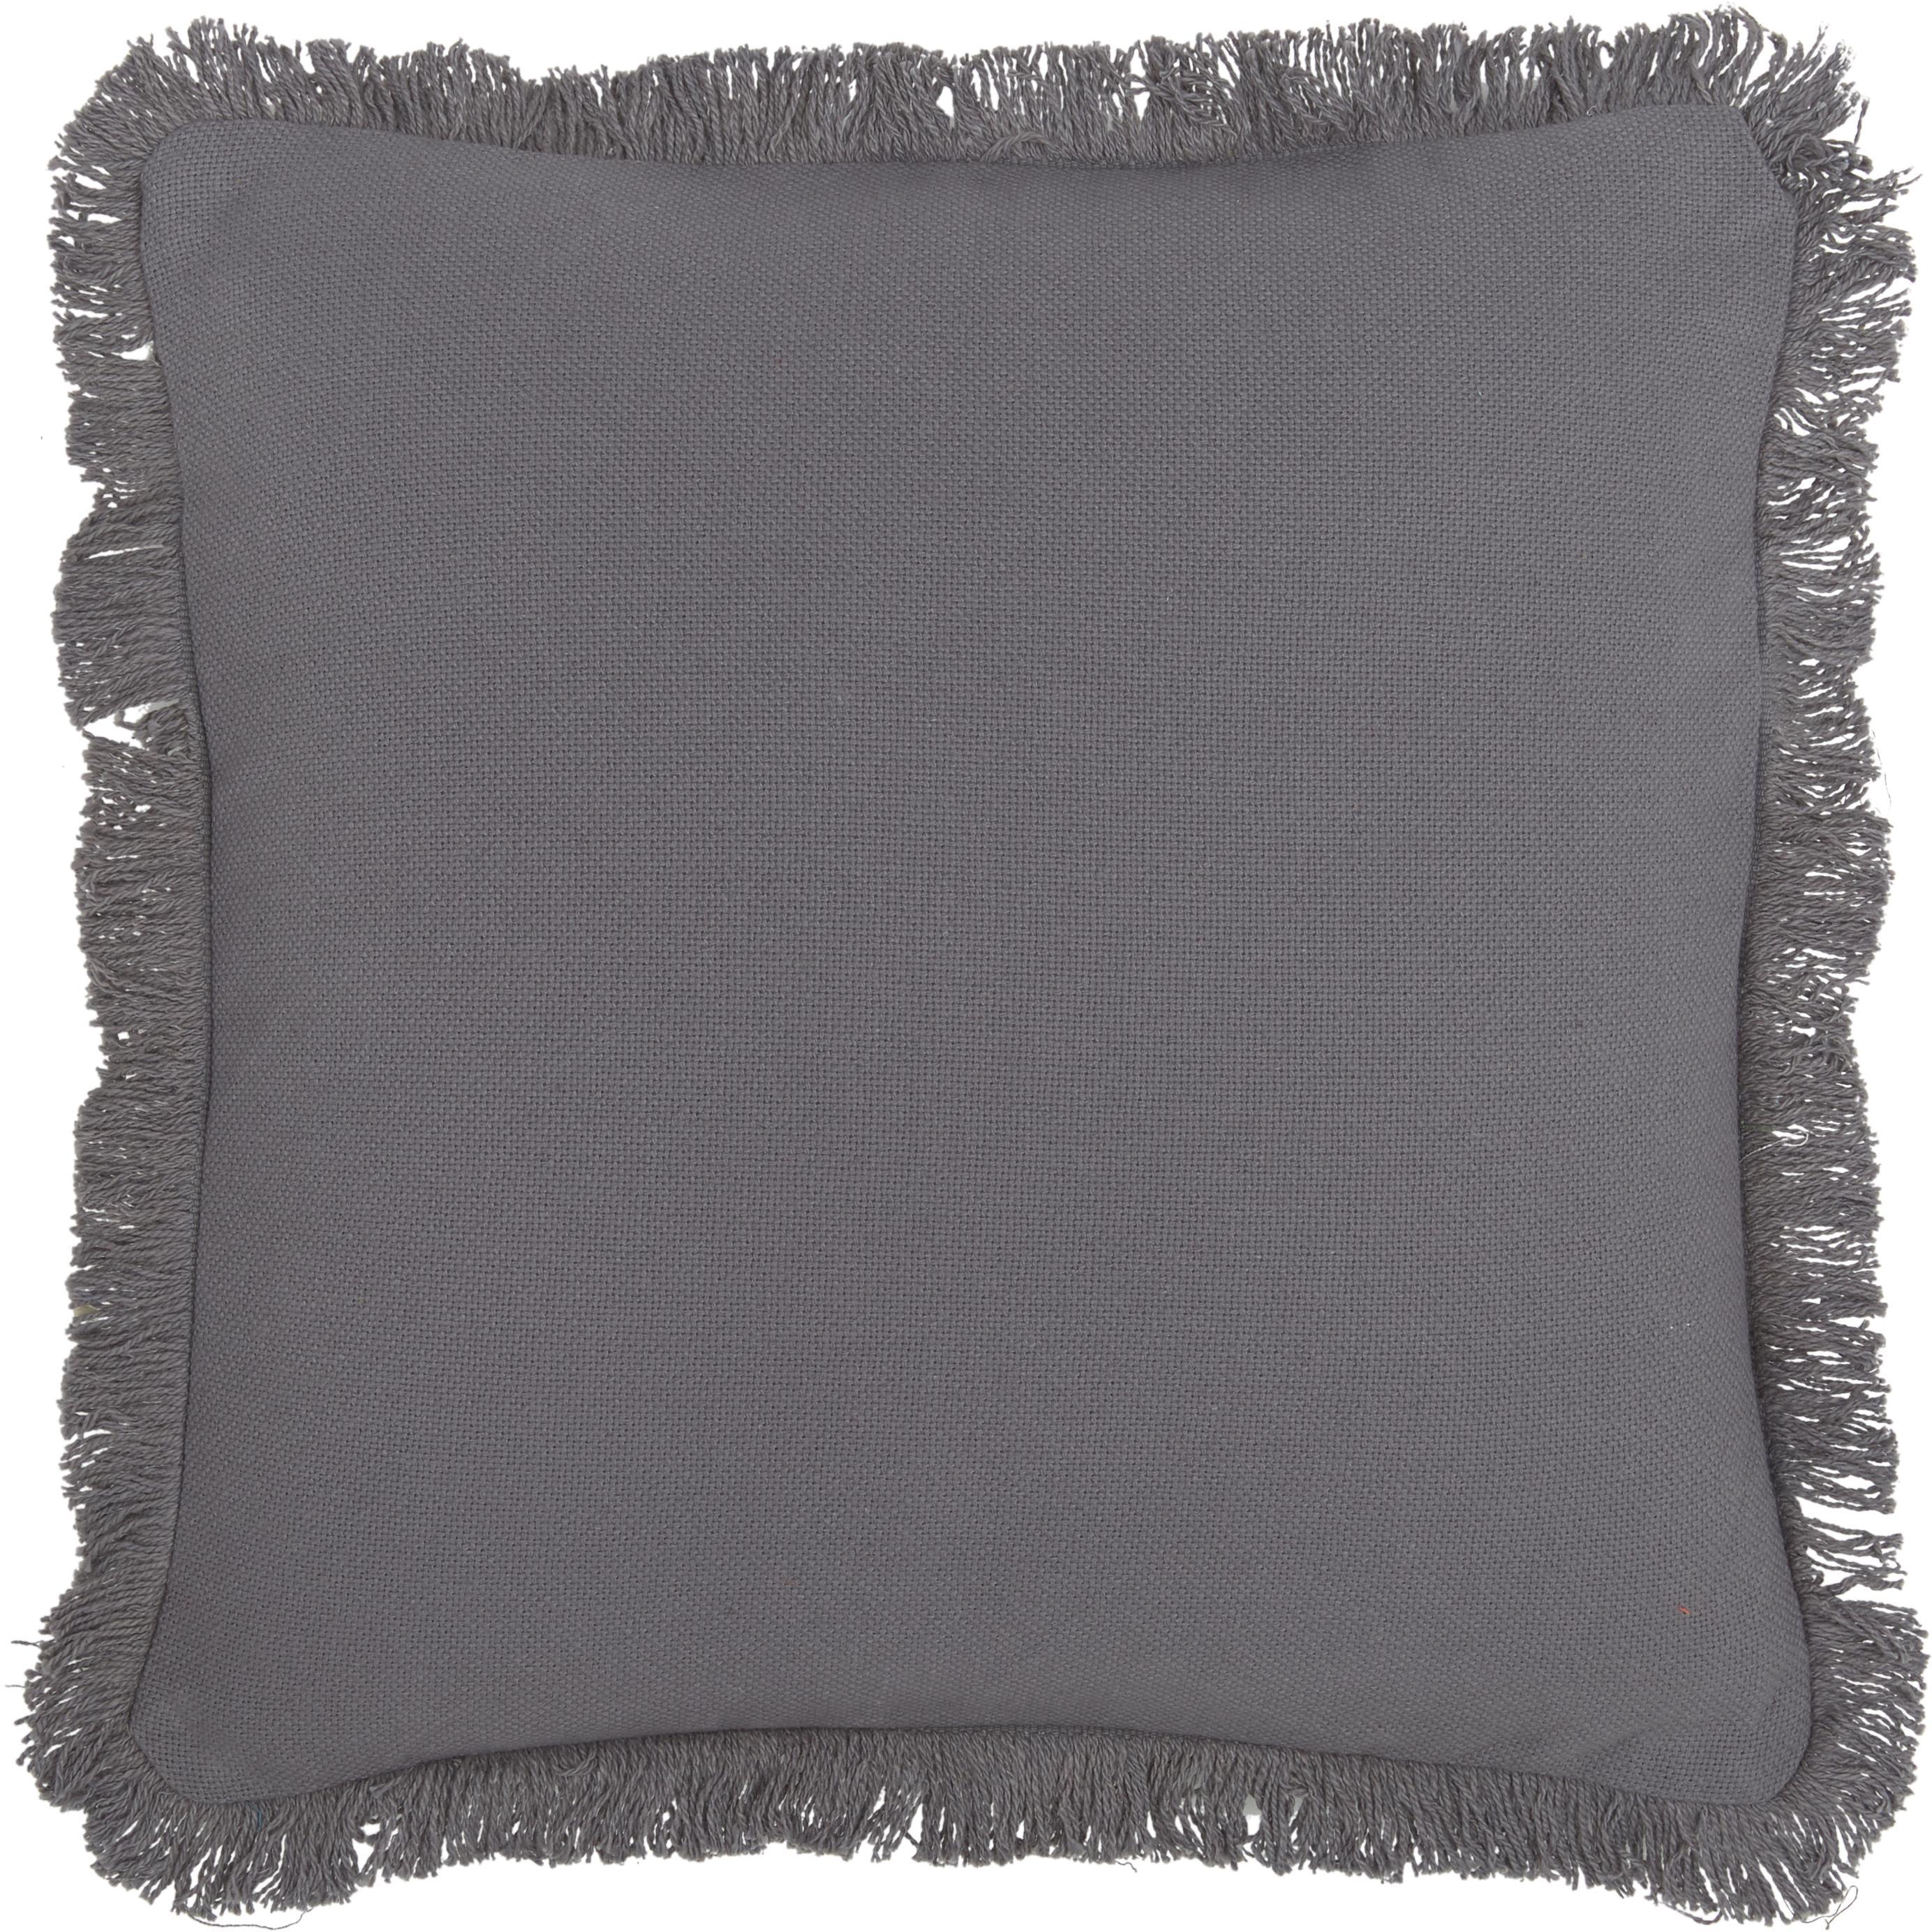 Cojín con flecos Prague, con relleno, Parte delantera: 100%algodón de tejido gr, Parte trasera: 100%algodón, Gris antracita, An 40 x L 40 cm